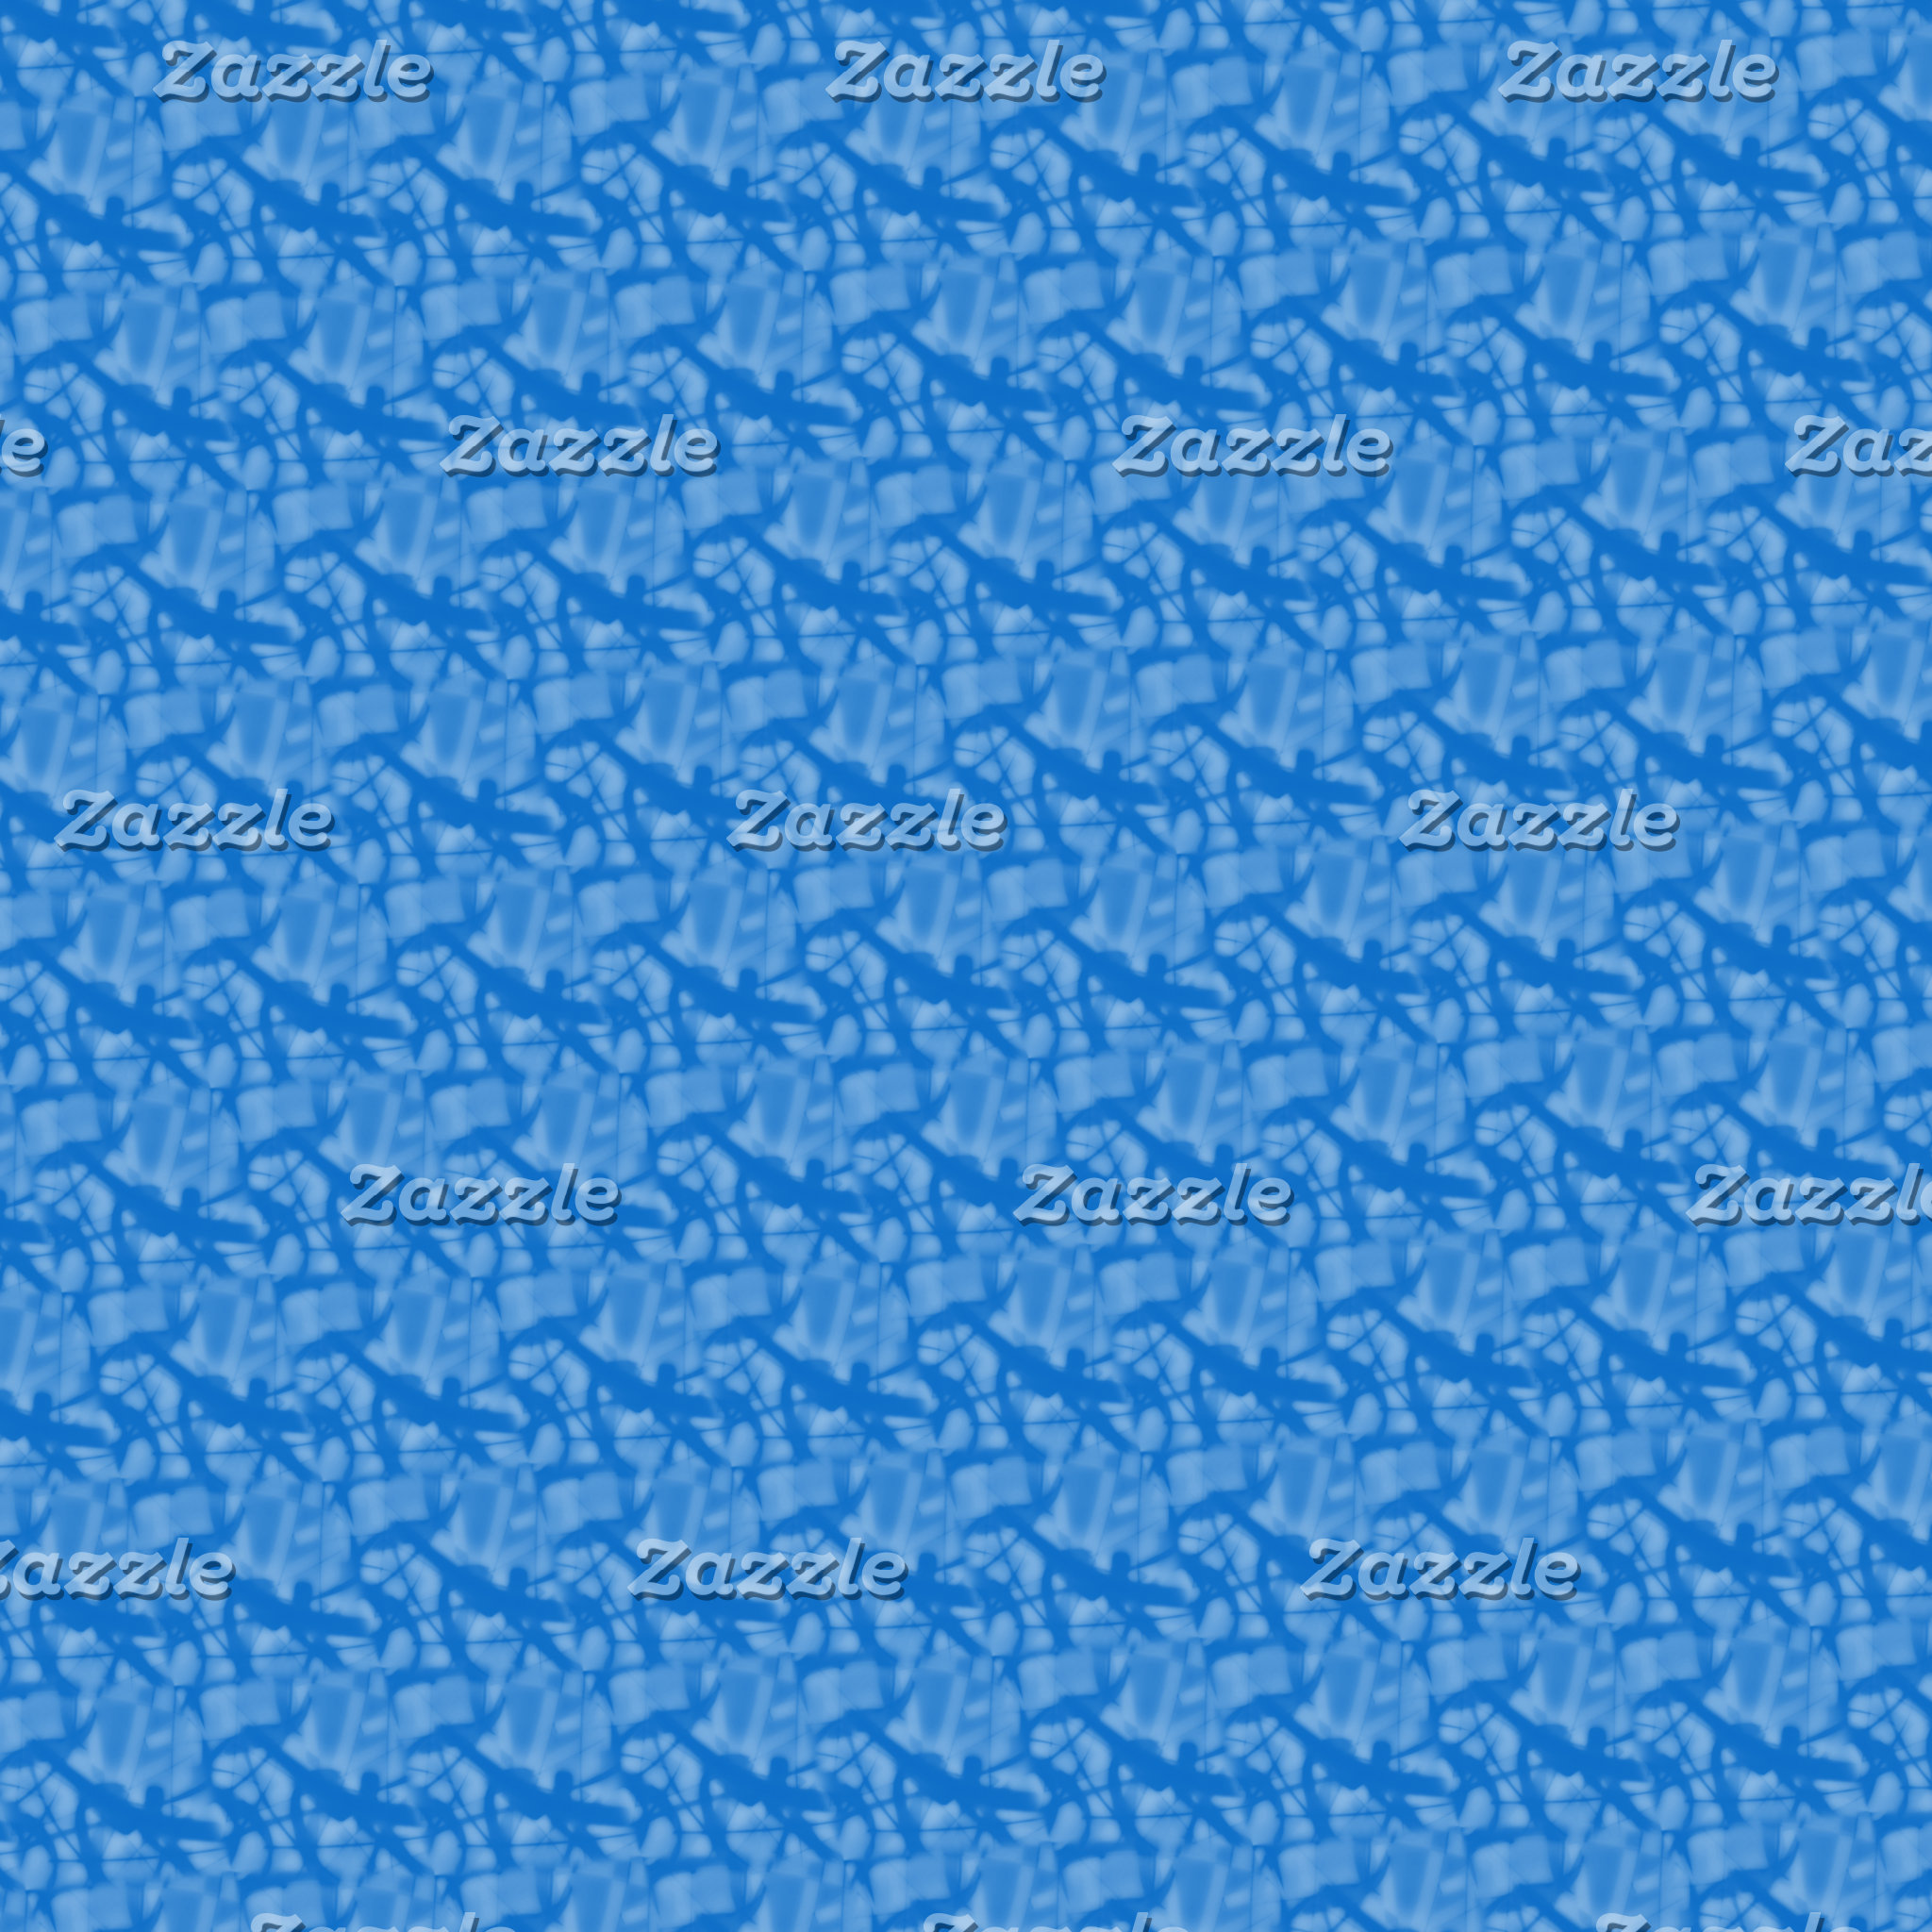 Blue Fractal-style Stuff